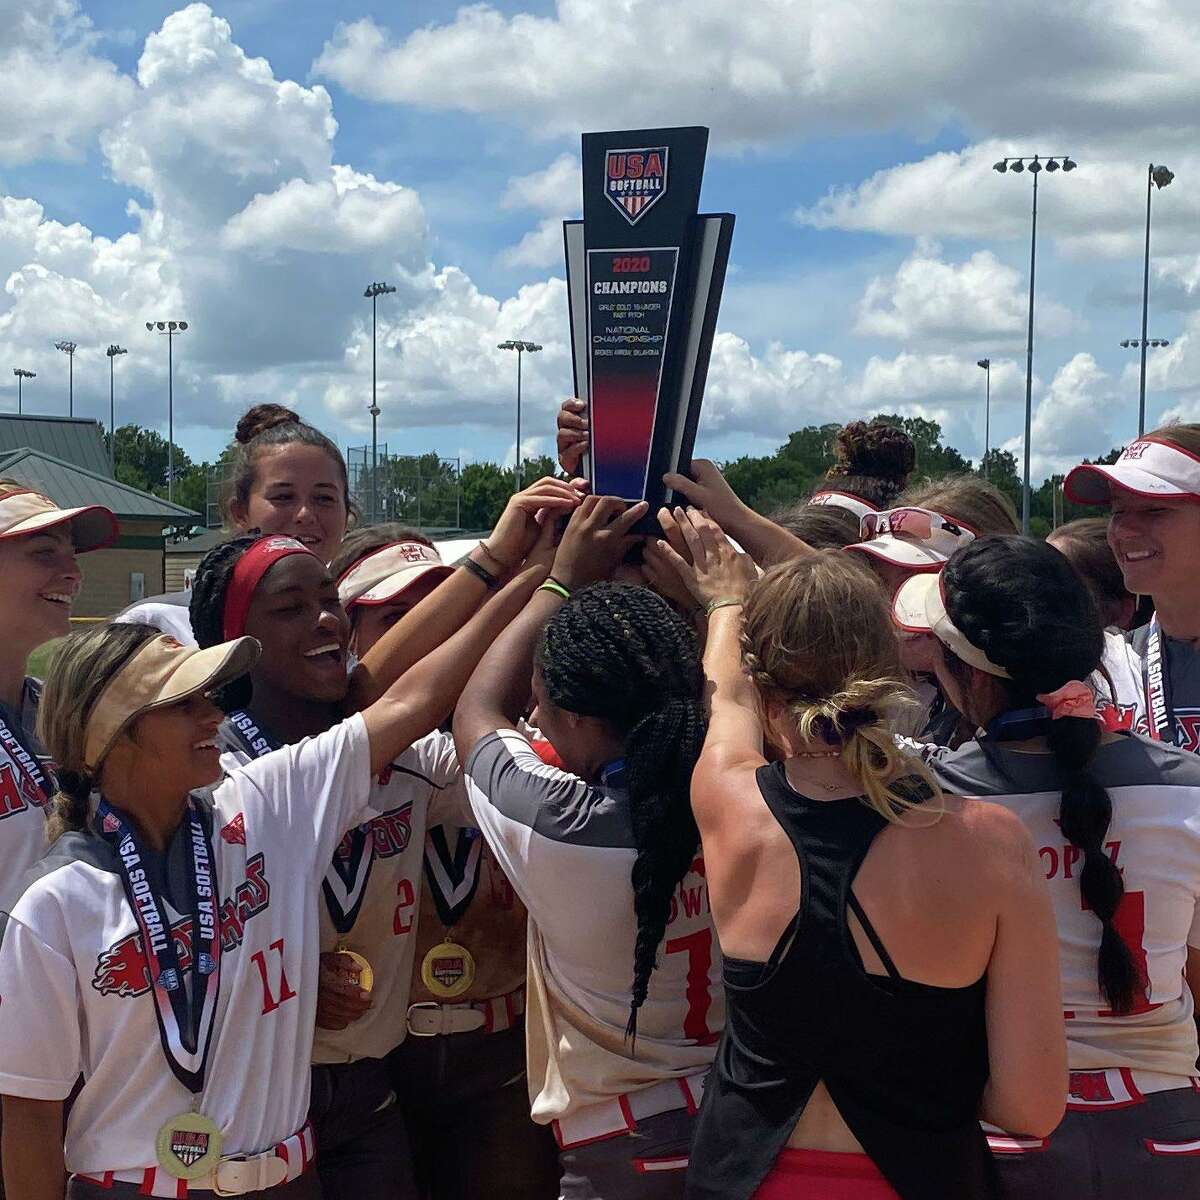 Hotshots Premier Nelson won the 16U national championship at theUSA Softball Gold National, July 20-25 in Oklahoma.